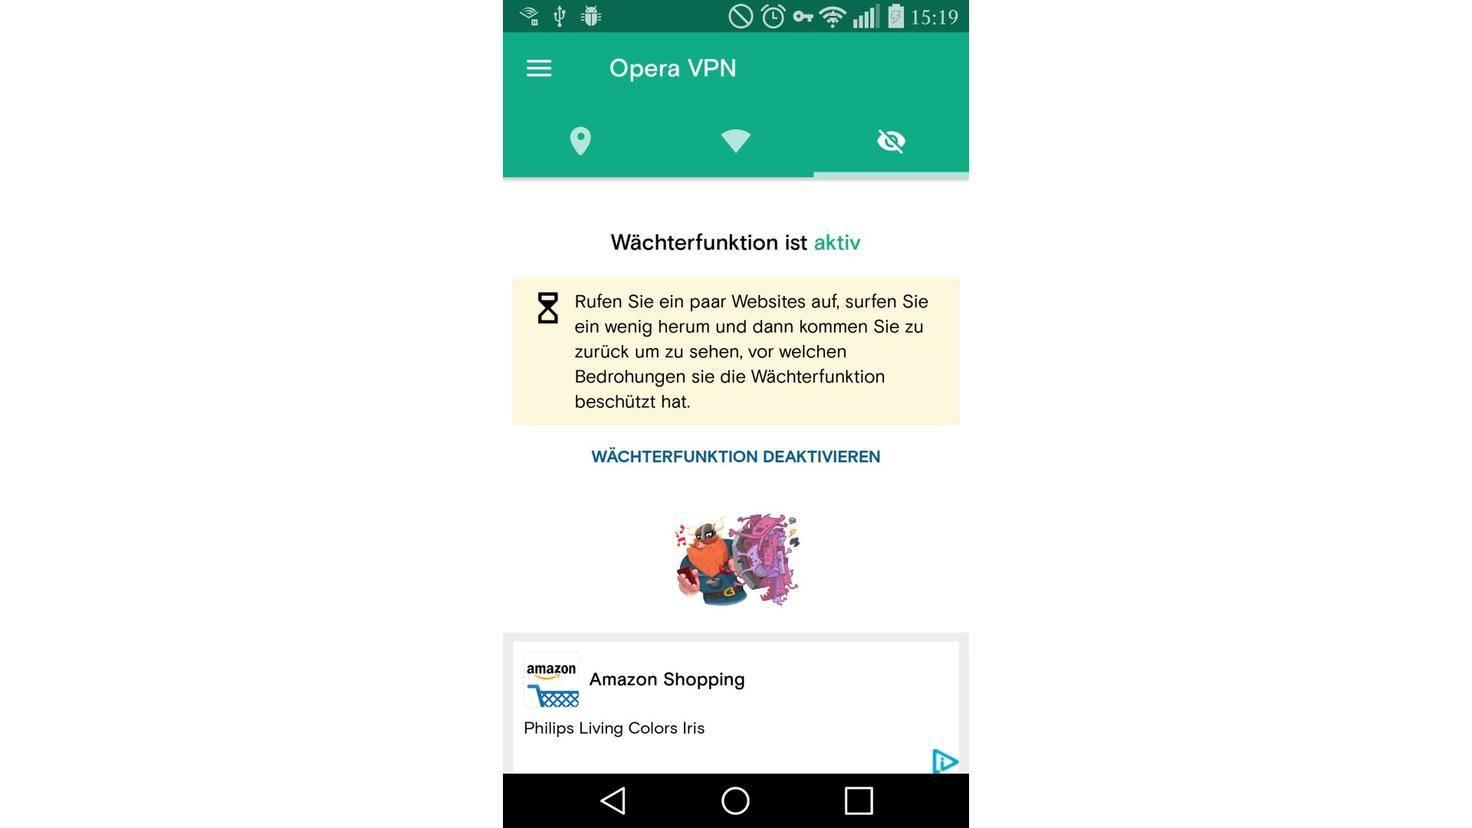 Opera VPN Smartphone